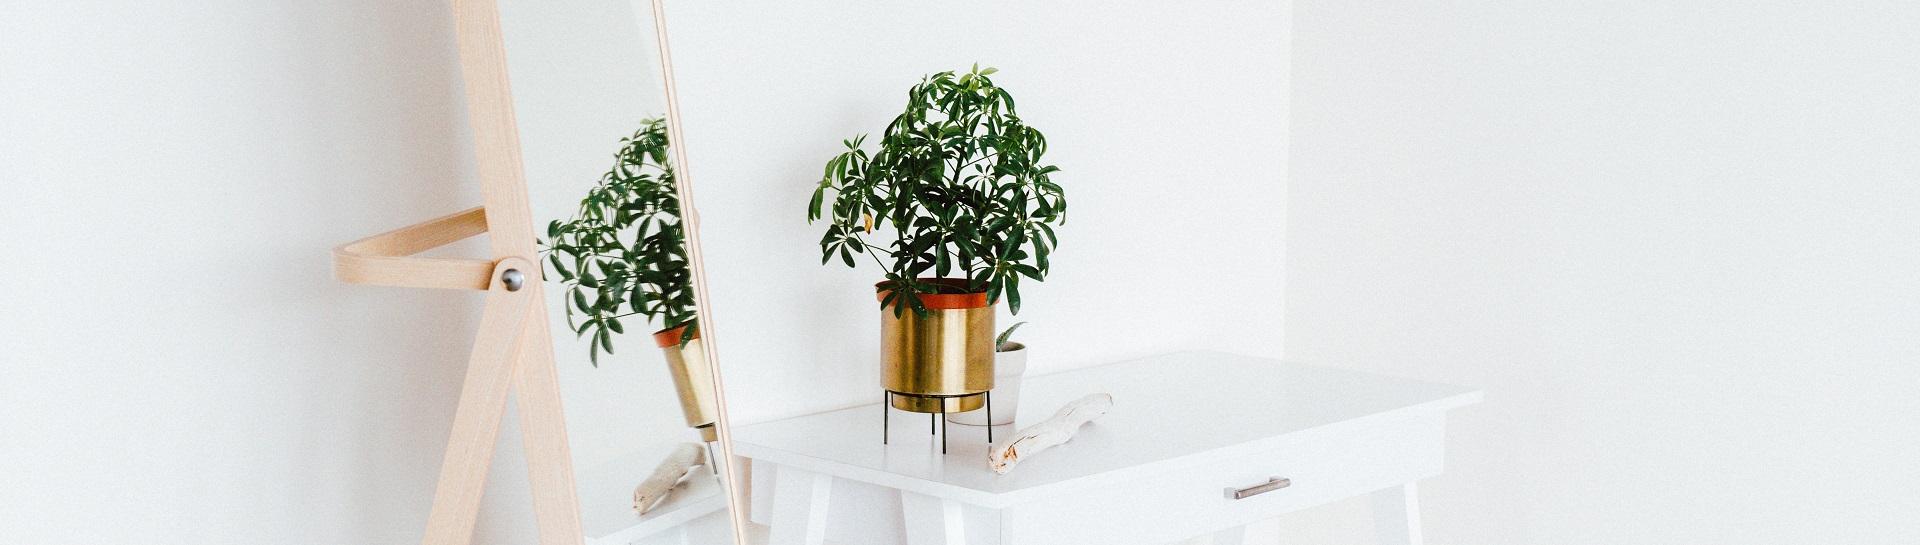 bambus spiegel kaufen bambus freunde. Black Bedroom Furniture Sets. Home Design Ideas